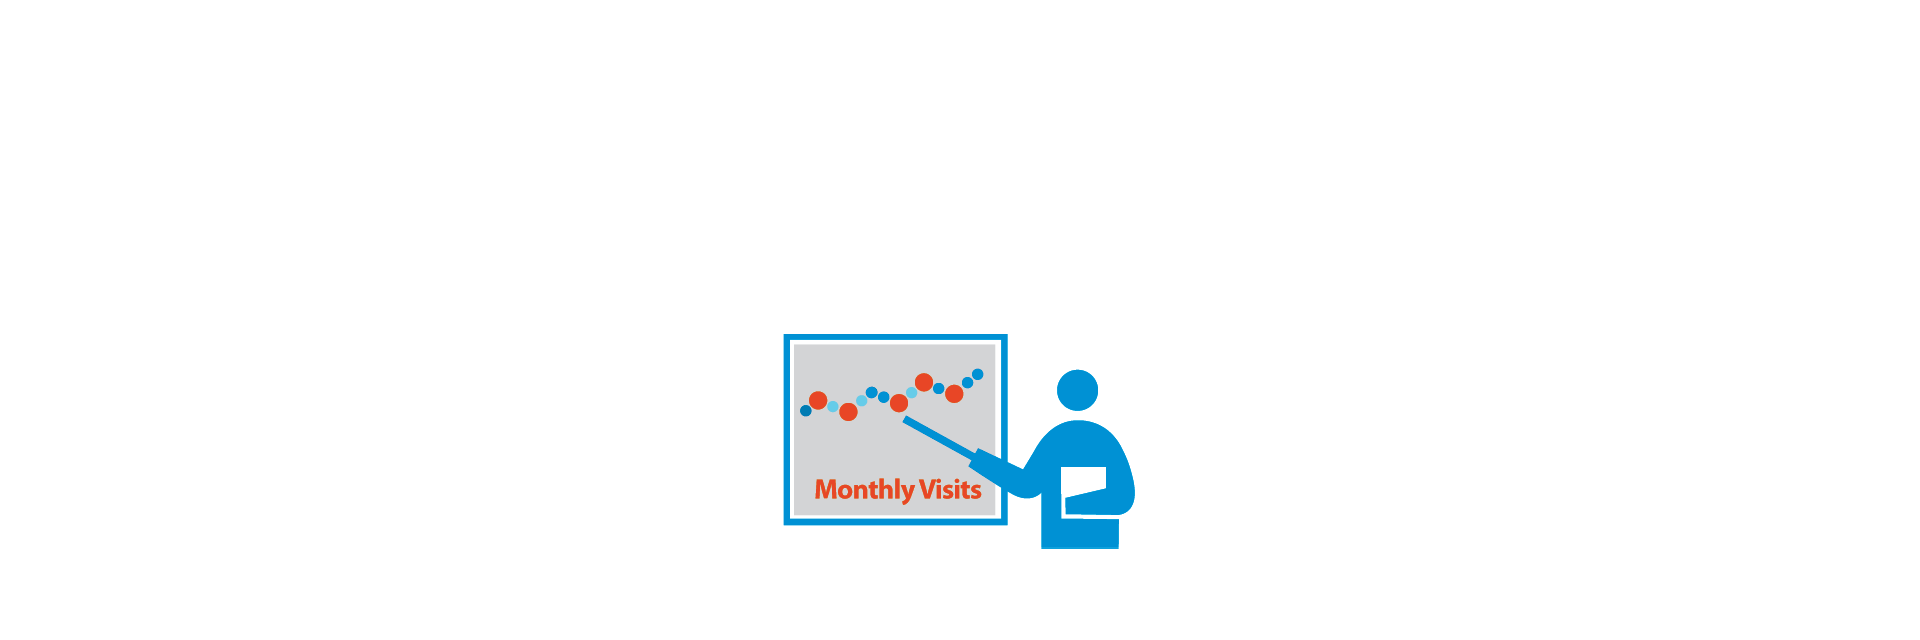 Website redesign benchmark template aiden marketing full service website redesign benchmark template maxwellsz